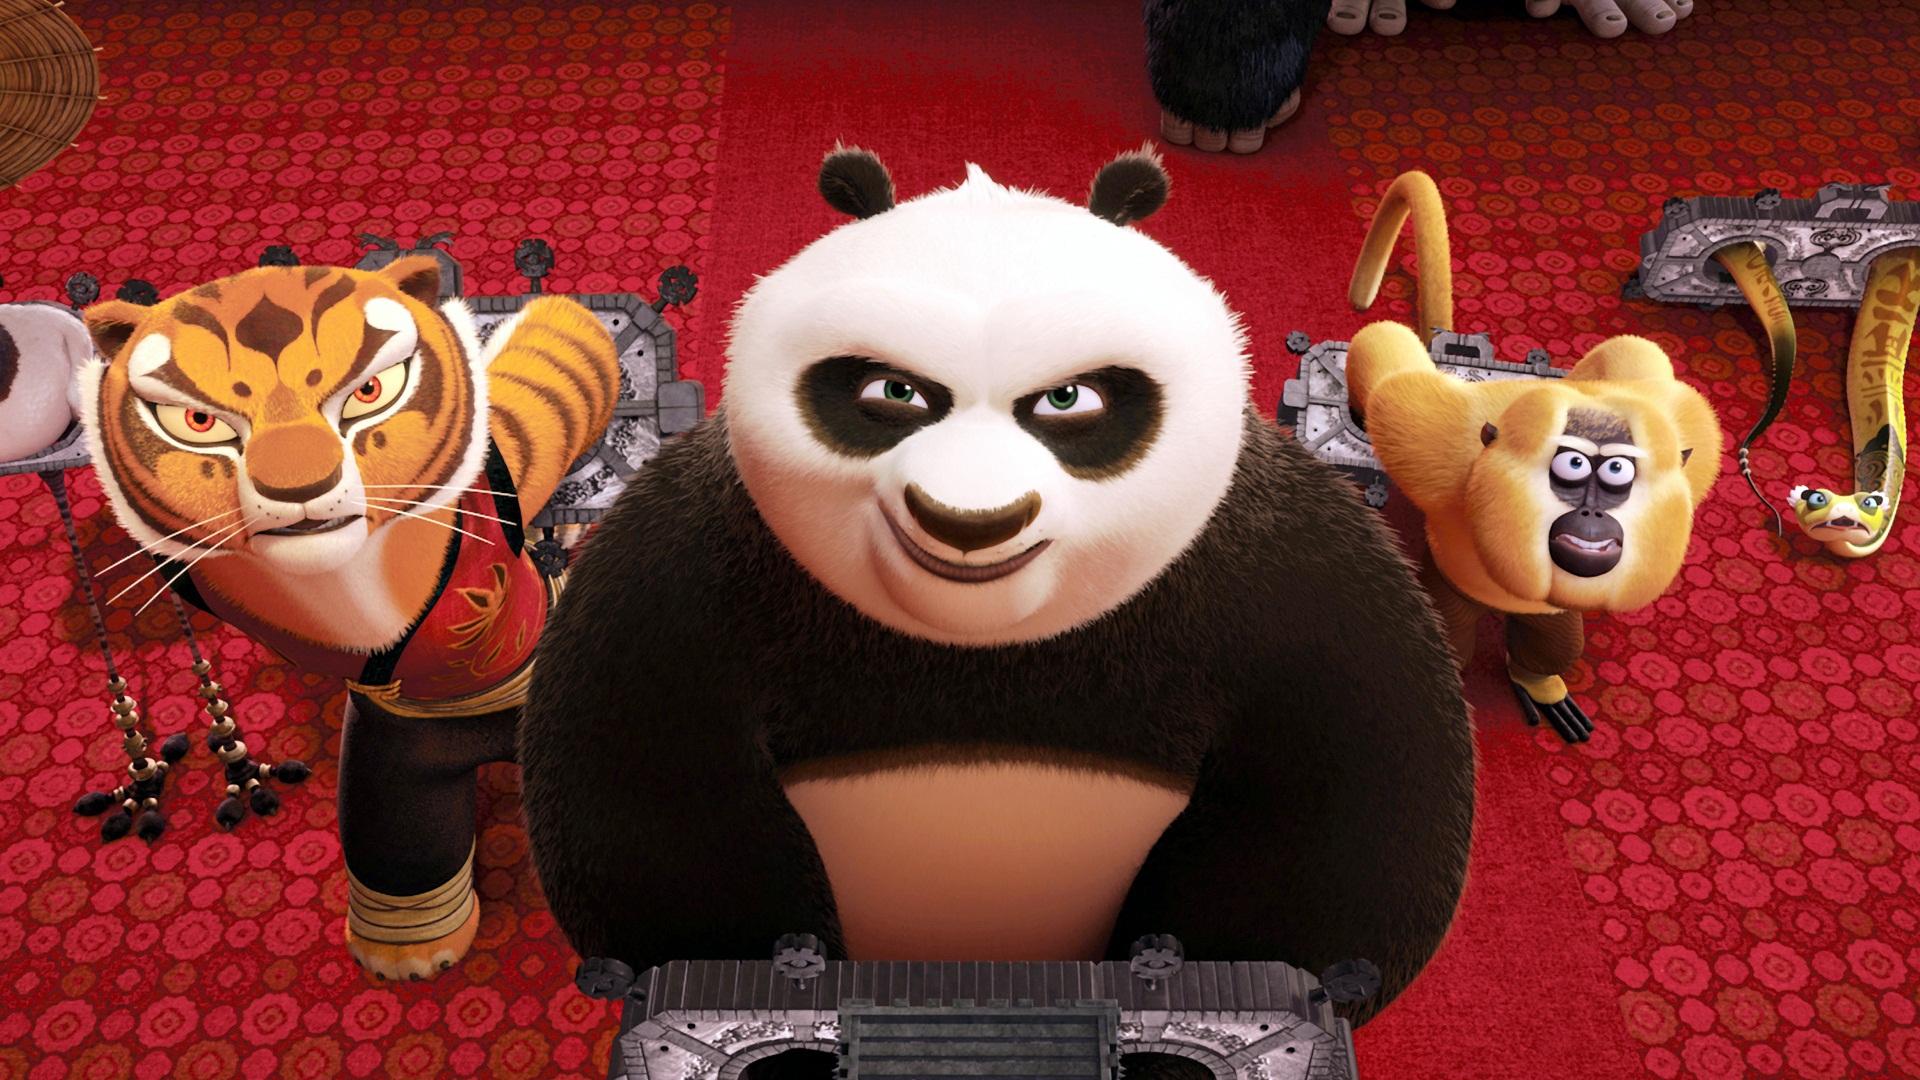 Free Download Kung Fu Panda 2 Hd Wallpapers Hd Wallpapers